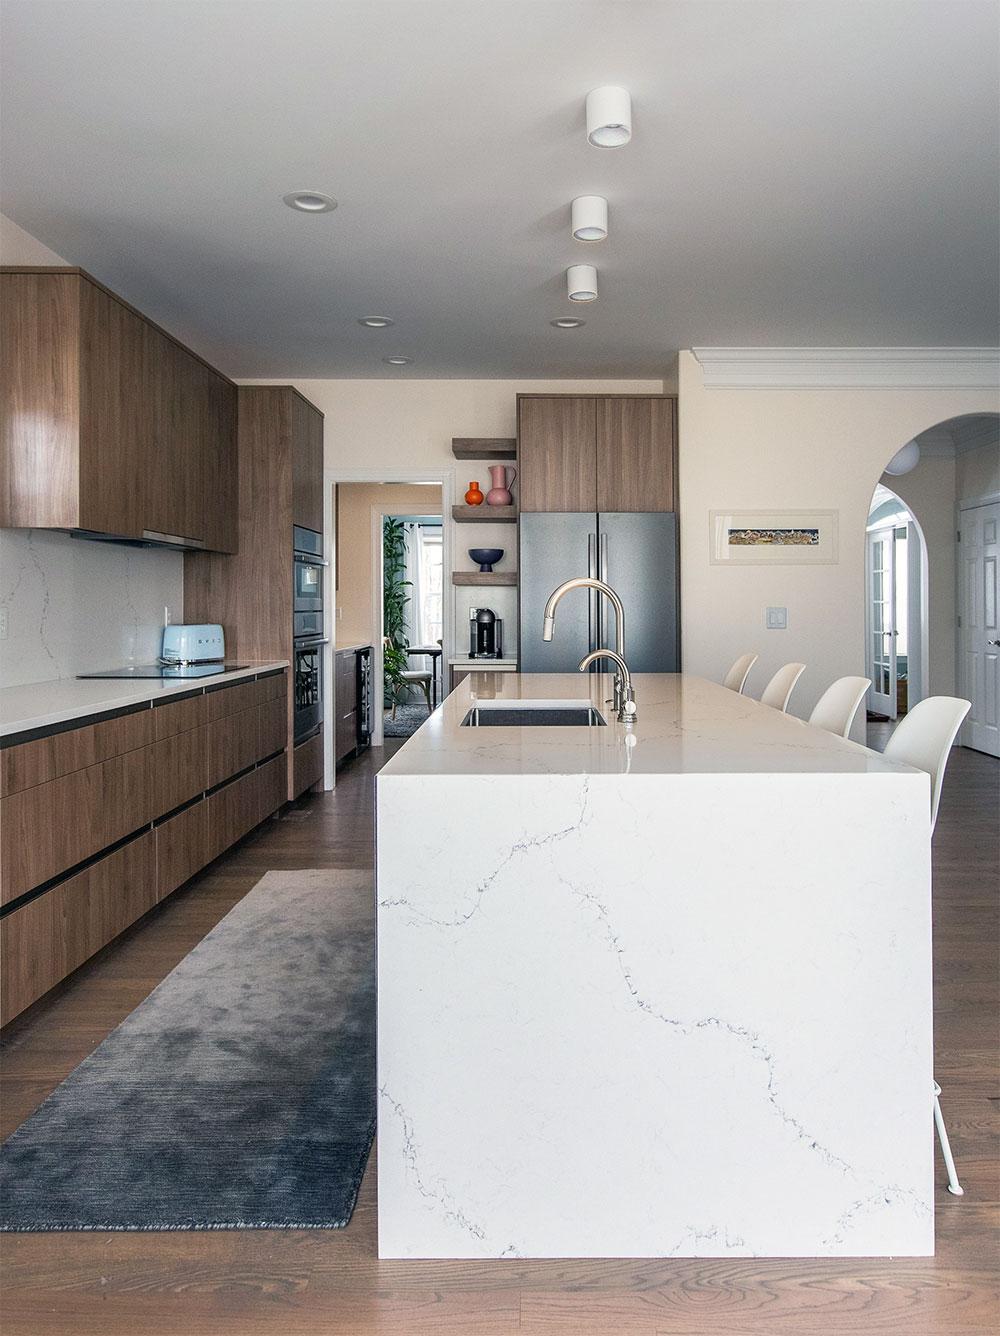 Alton Kitchen Remodel and Design: Island